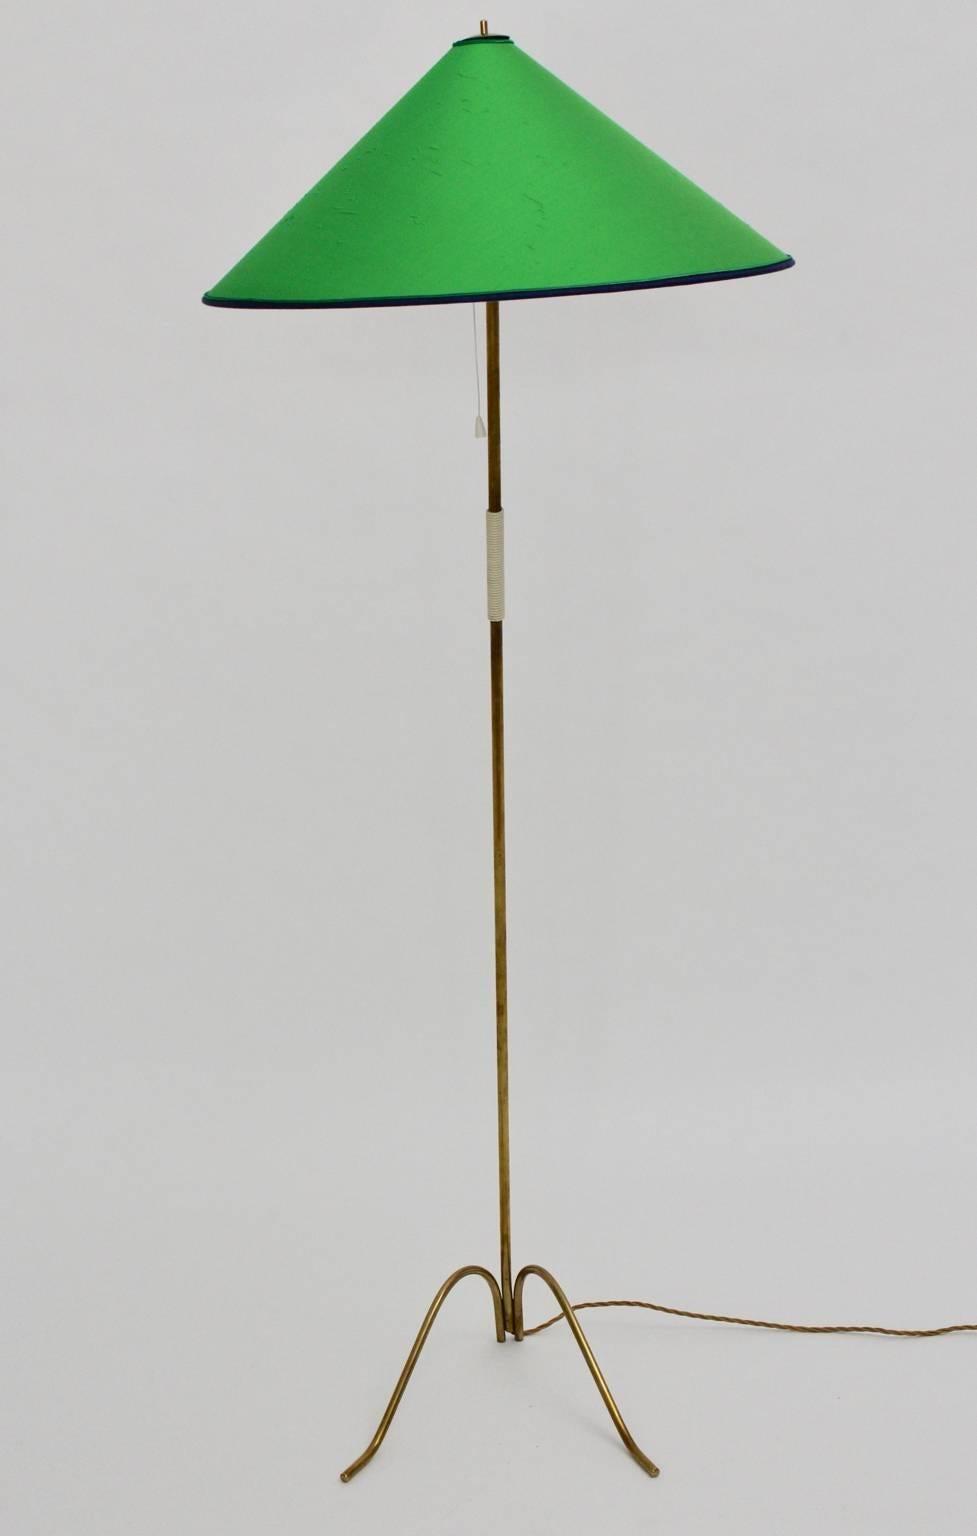 Mid Century Modern Brass Floor Lamp Green Lampshade By Rupert Nikoll 1950 Vienna